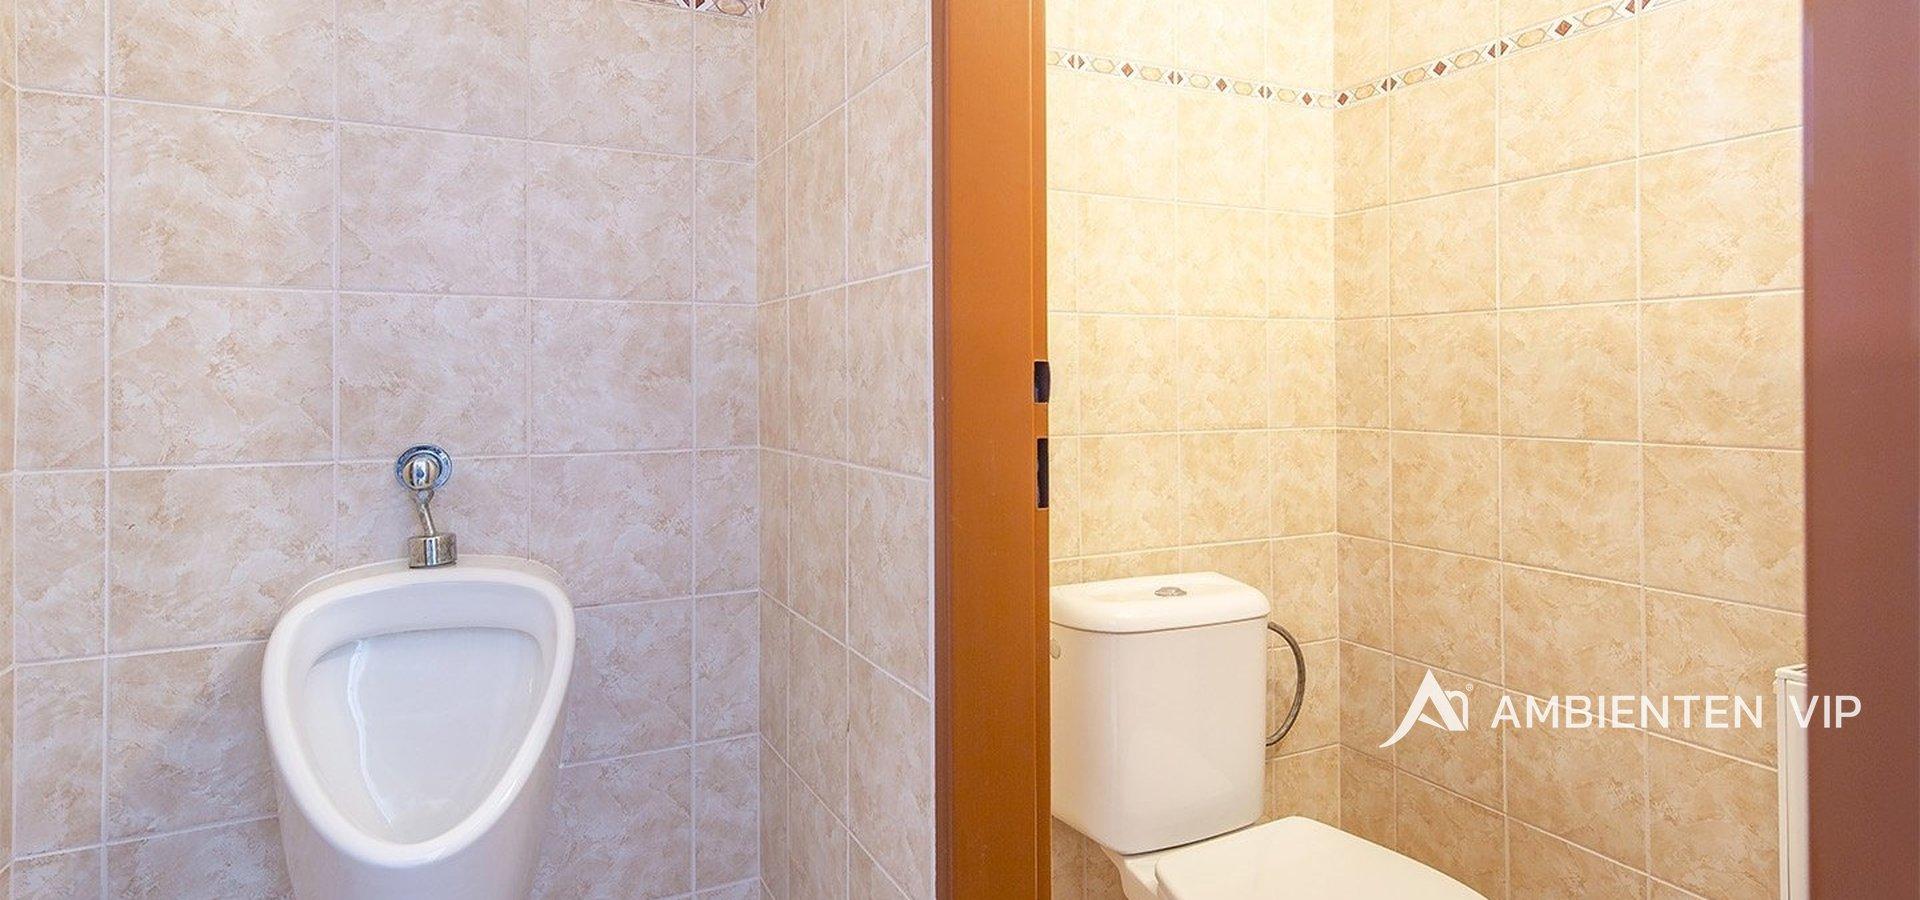 prodej-rodinneho-domu-na-bydleni-i-investici-477m2-telc-27merge-c46cdc